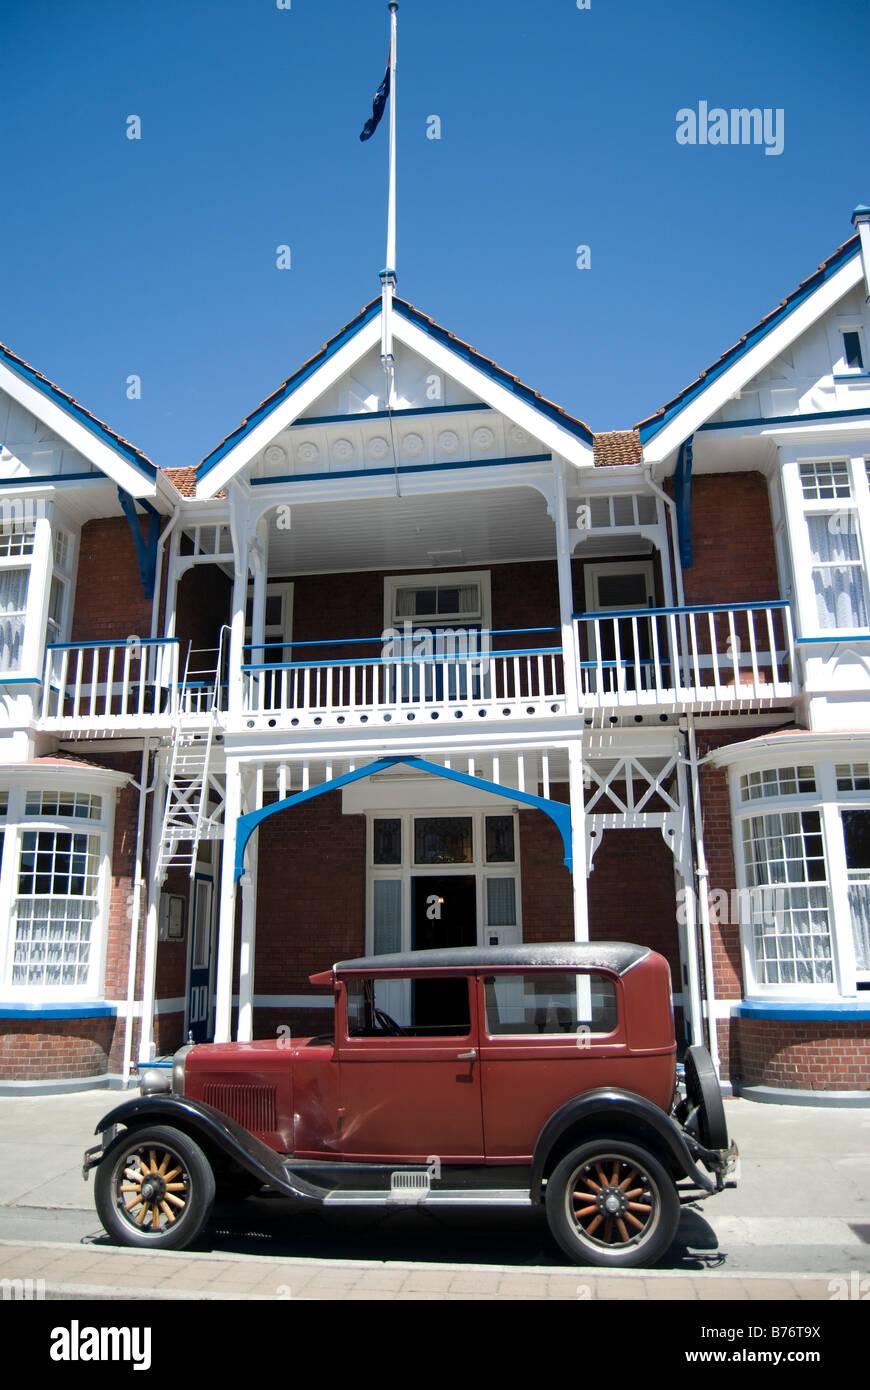 Vintage Erskine Auto außerhalb Windsor Hotel, Armagh Street, Christchurch, Canterbury, Neuseeland Stockbild